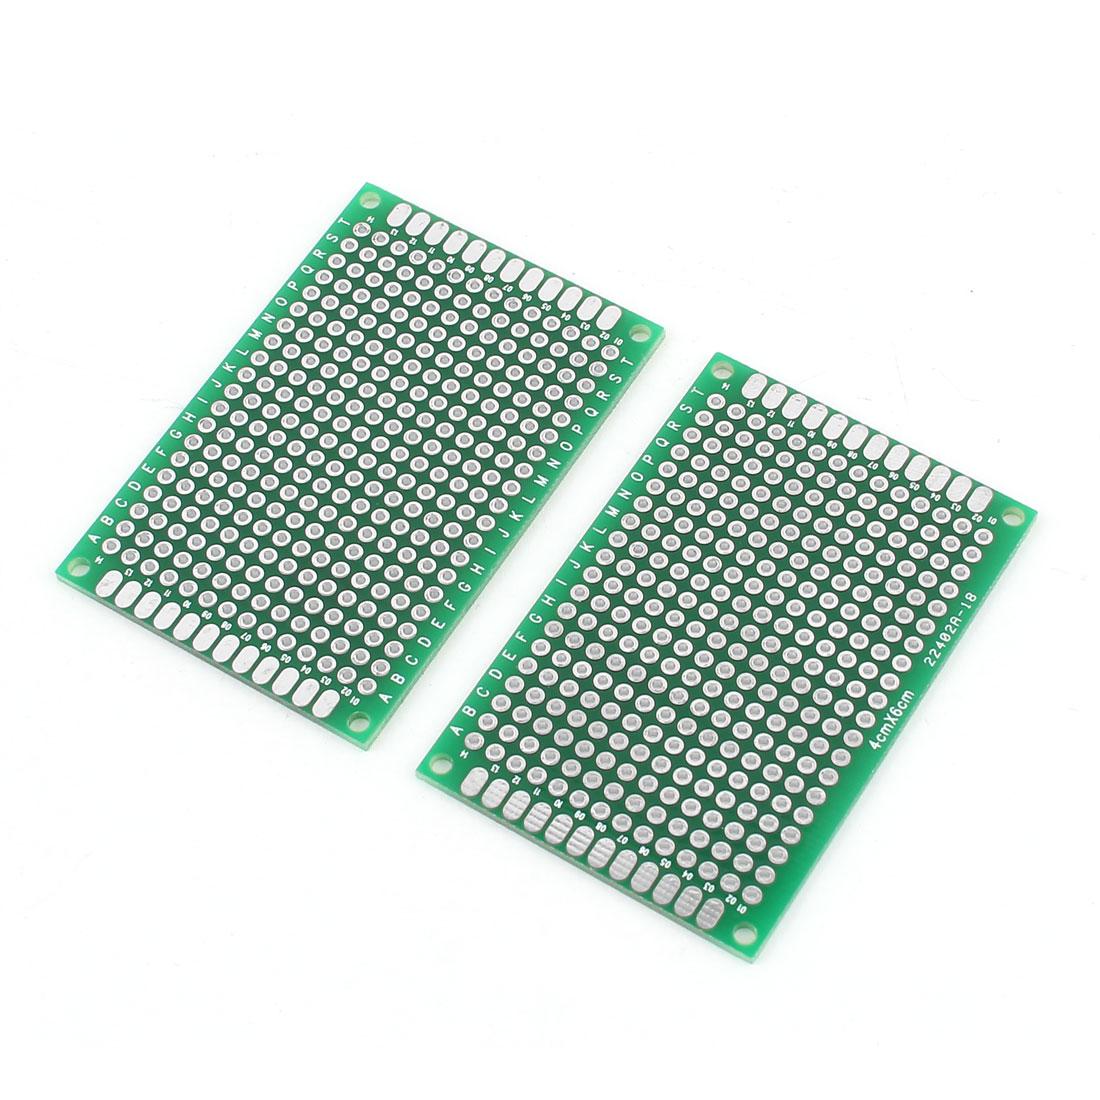 2 Pcs Universal Dual Side DIY Prototype PCB Board 4cmx6cm